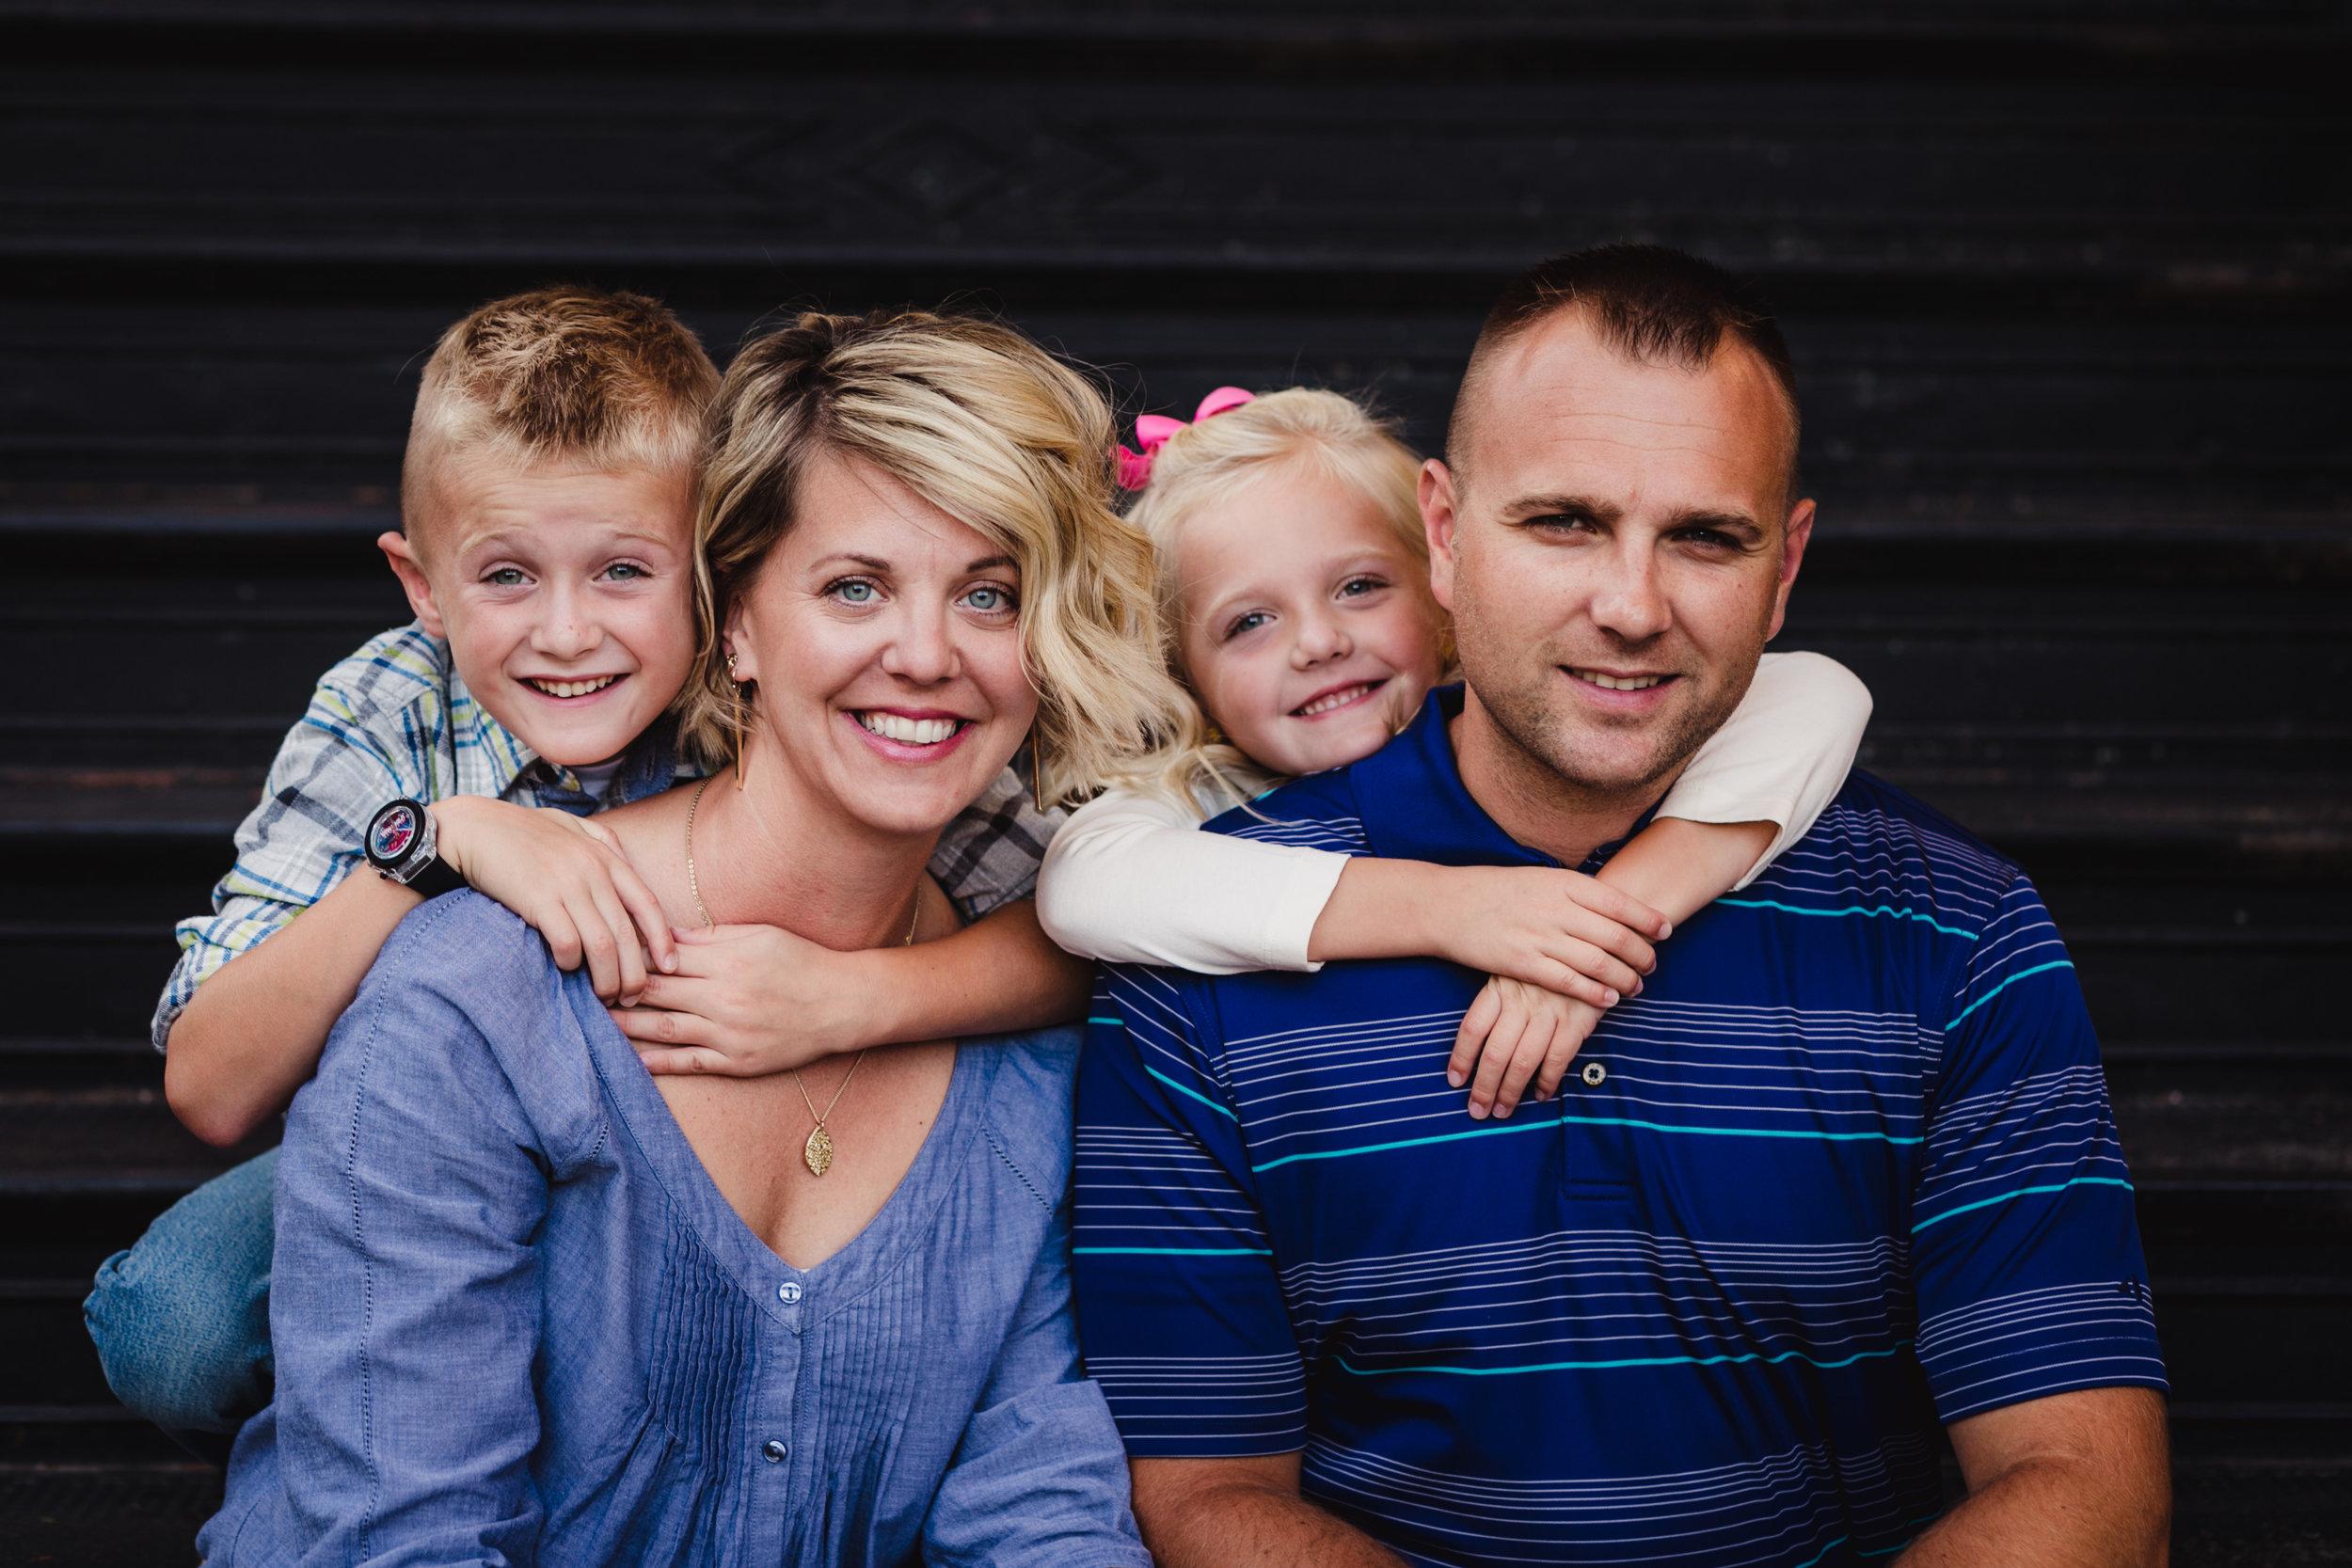 Immediate family, Professional Family Photos